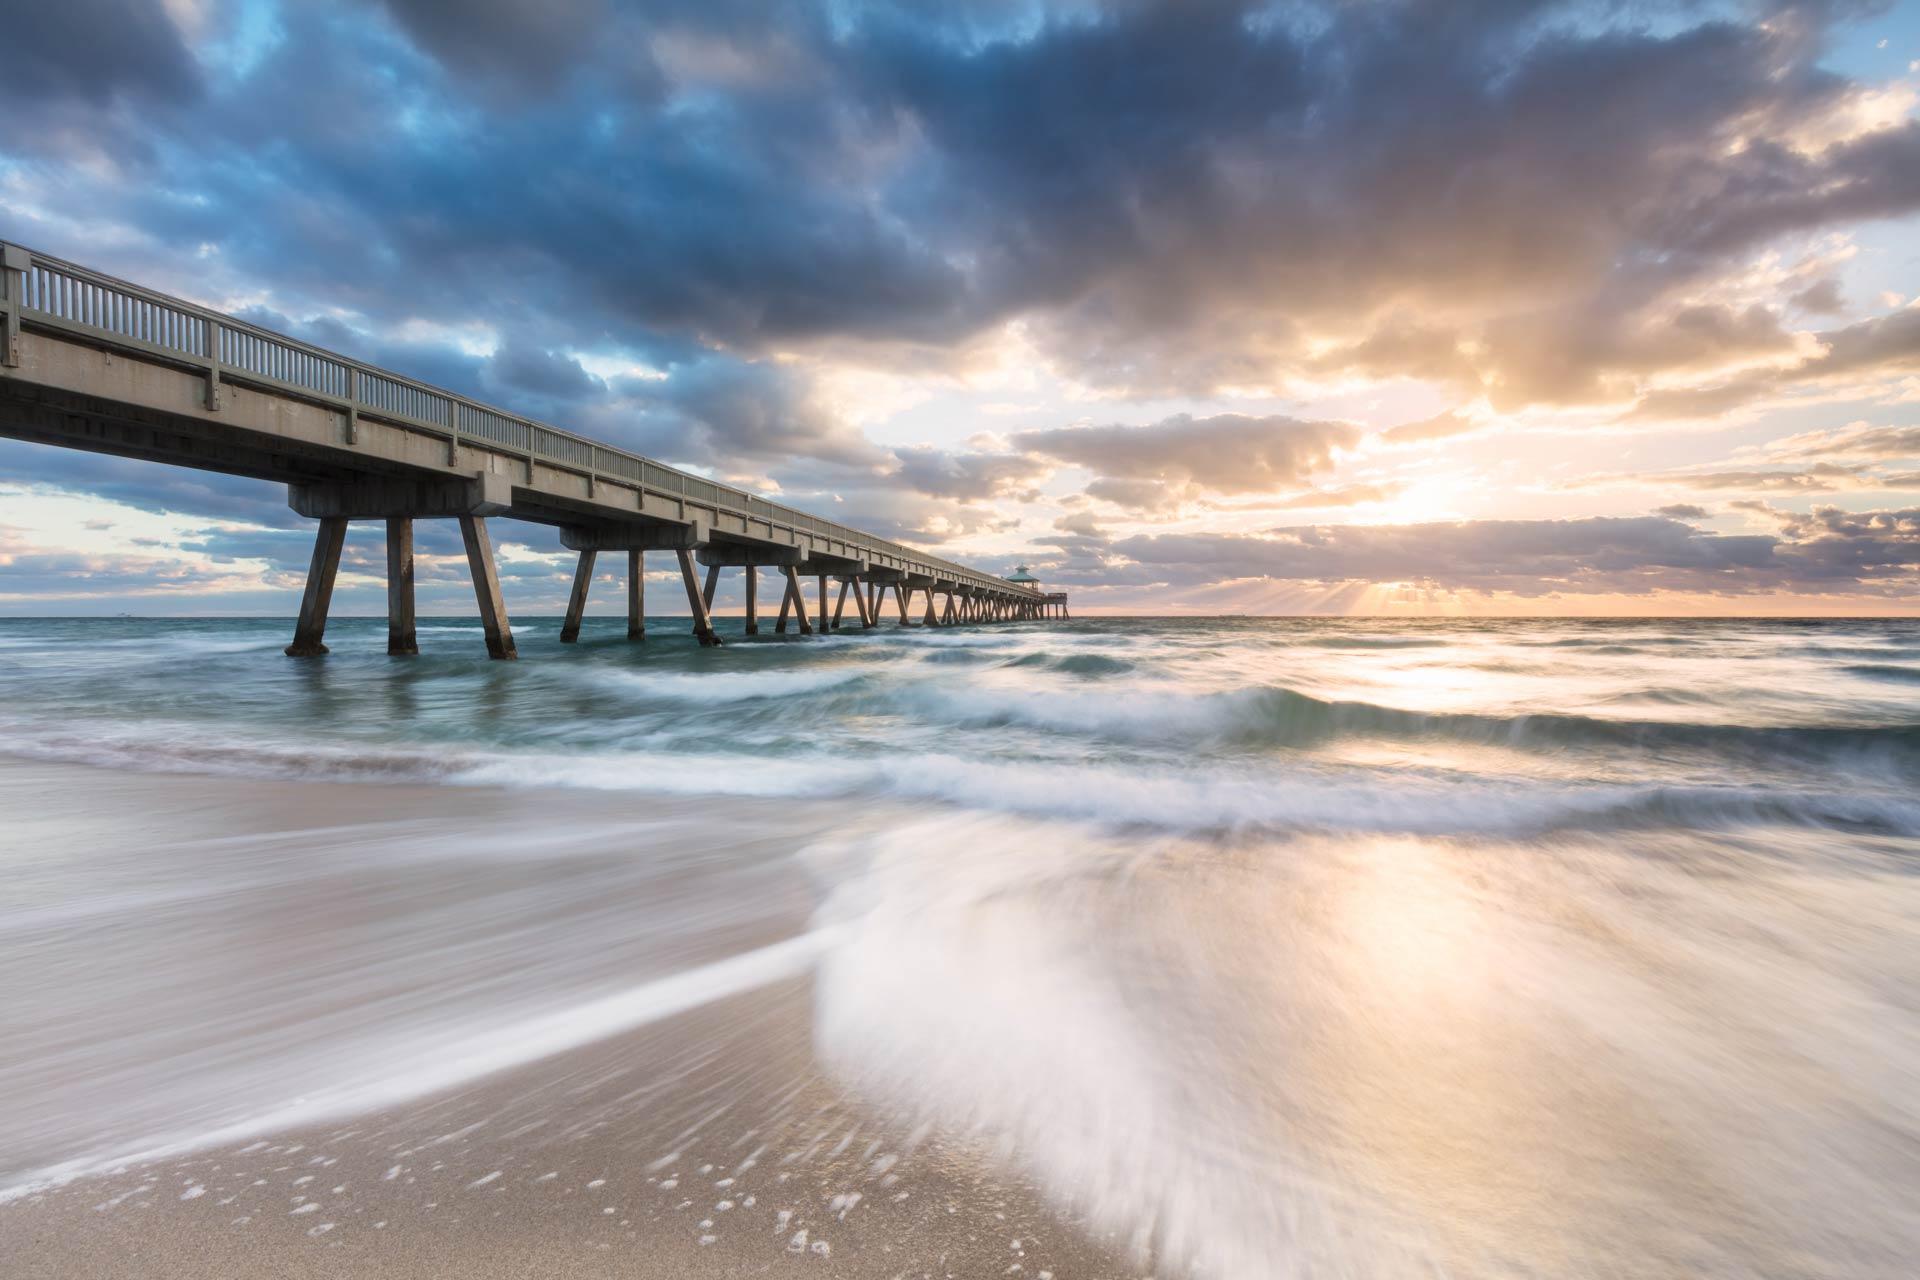 Florida seascape photography